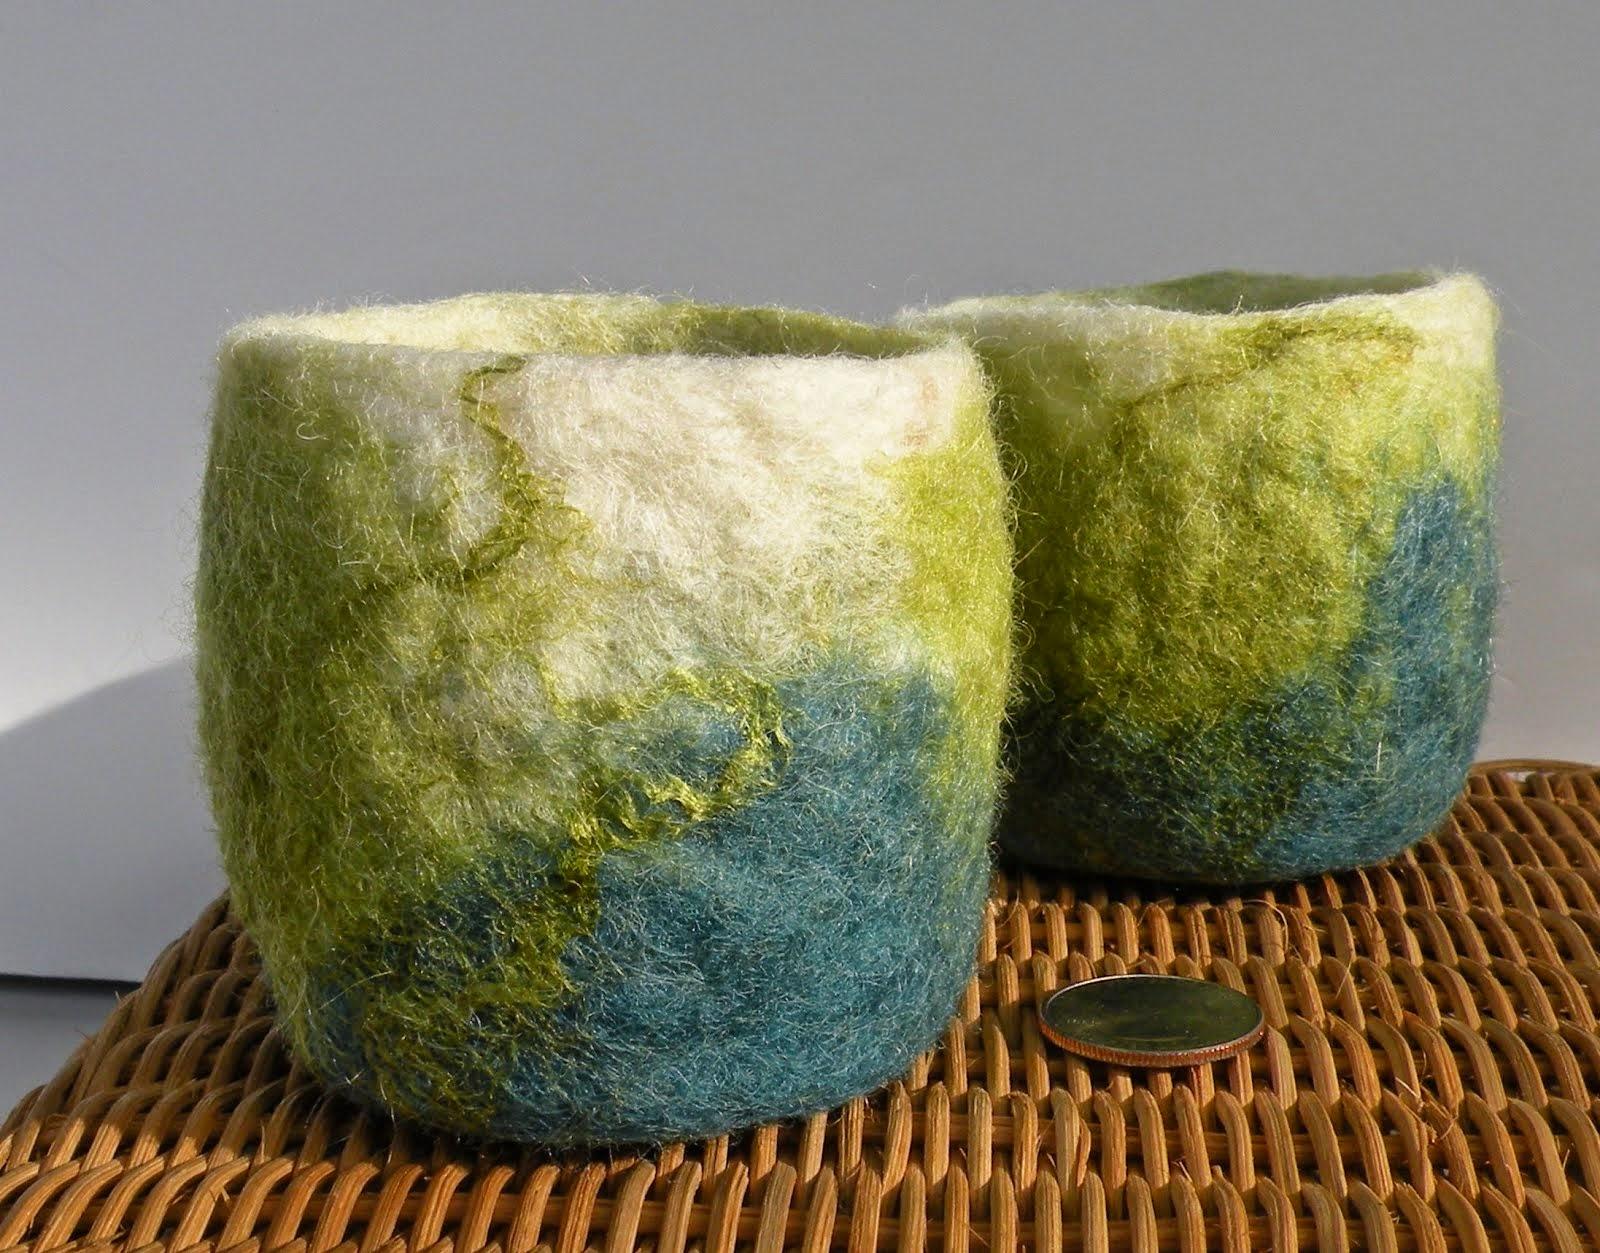 icelandic wool from Ireland